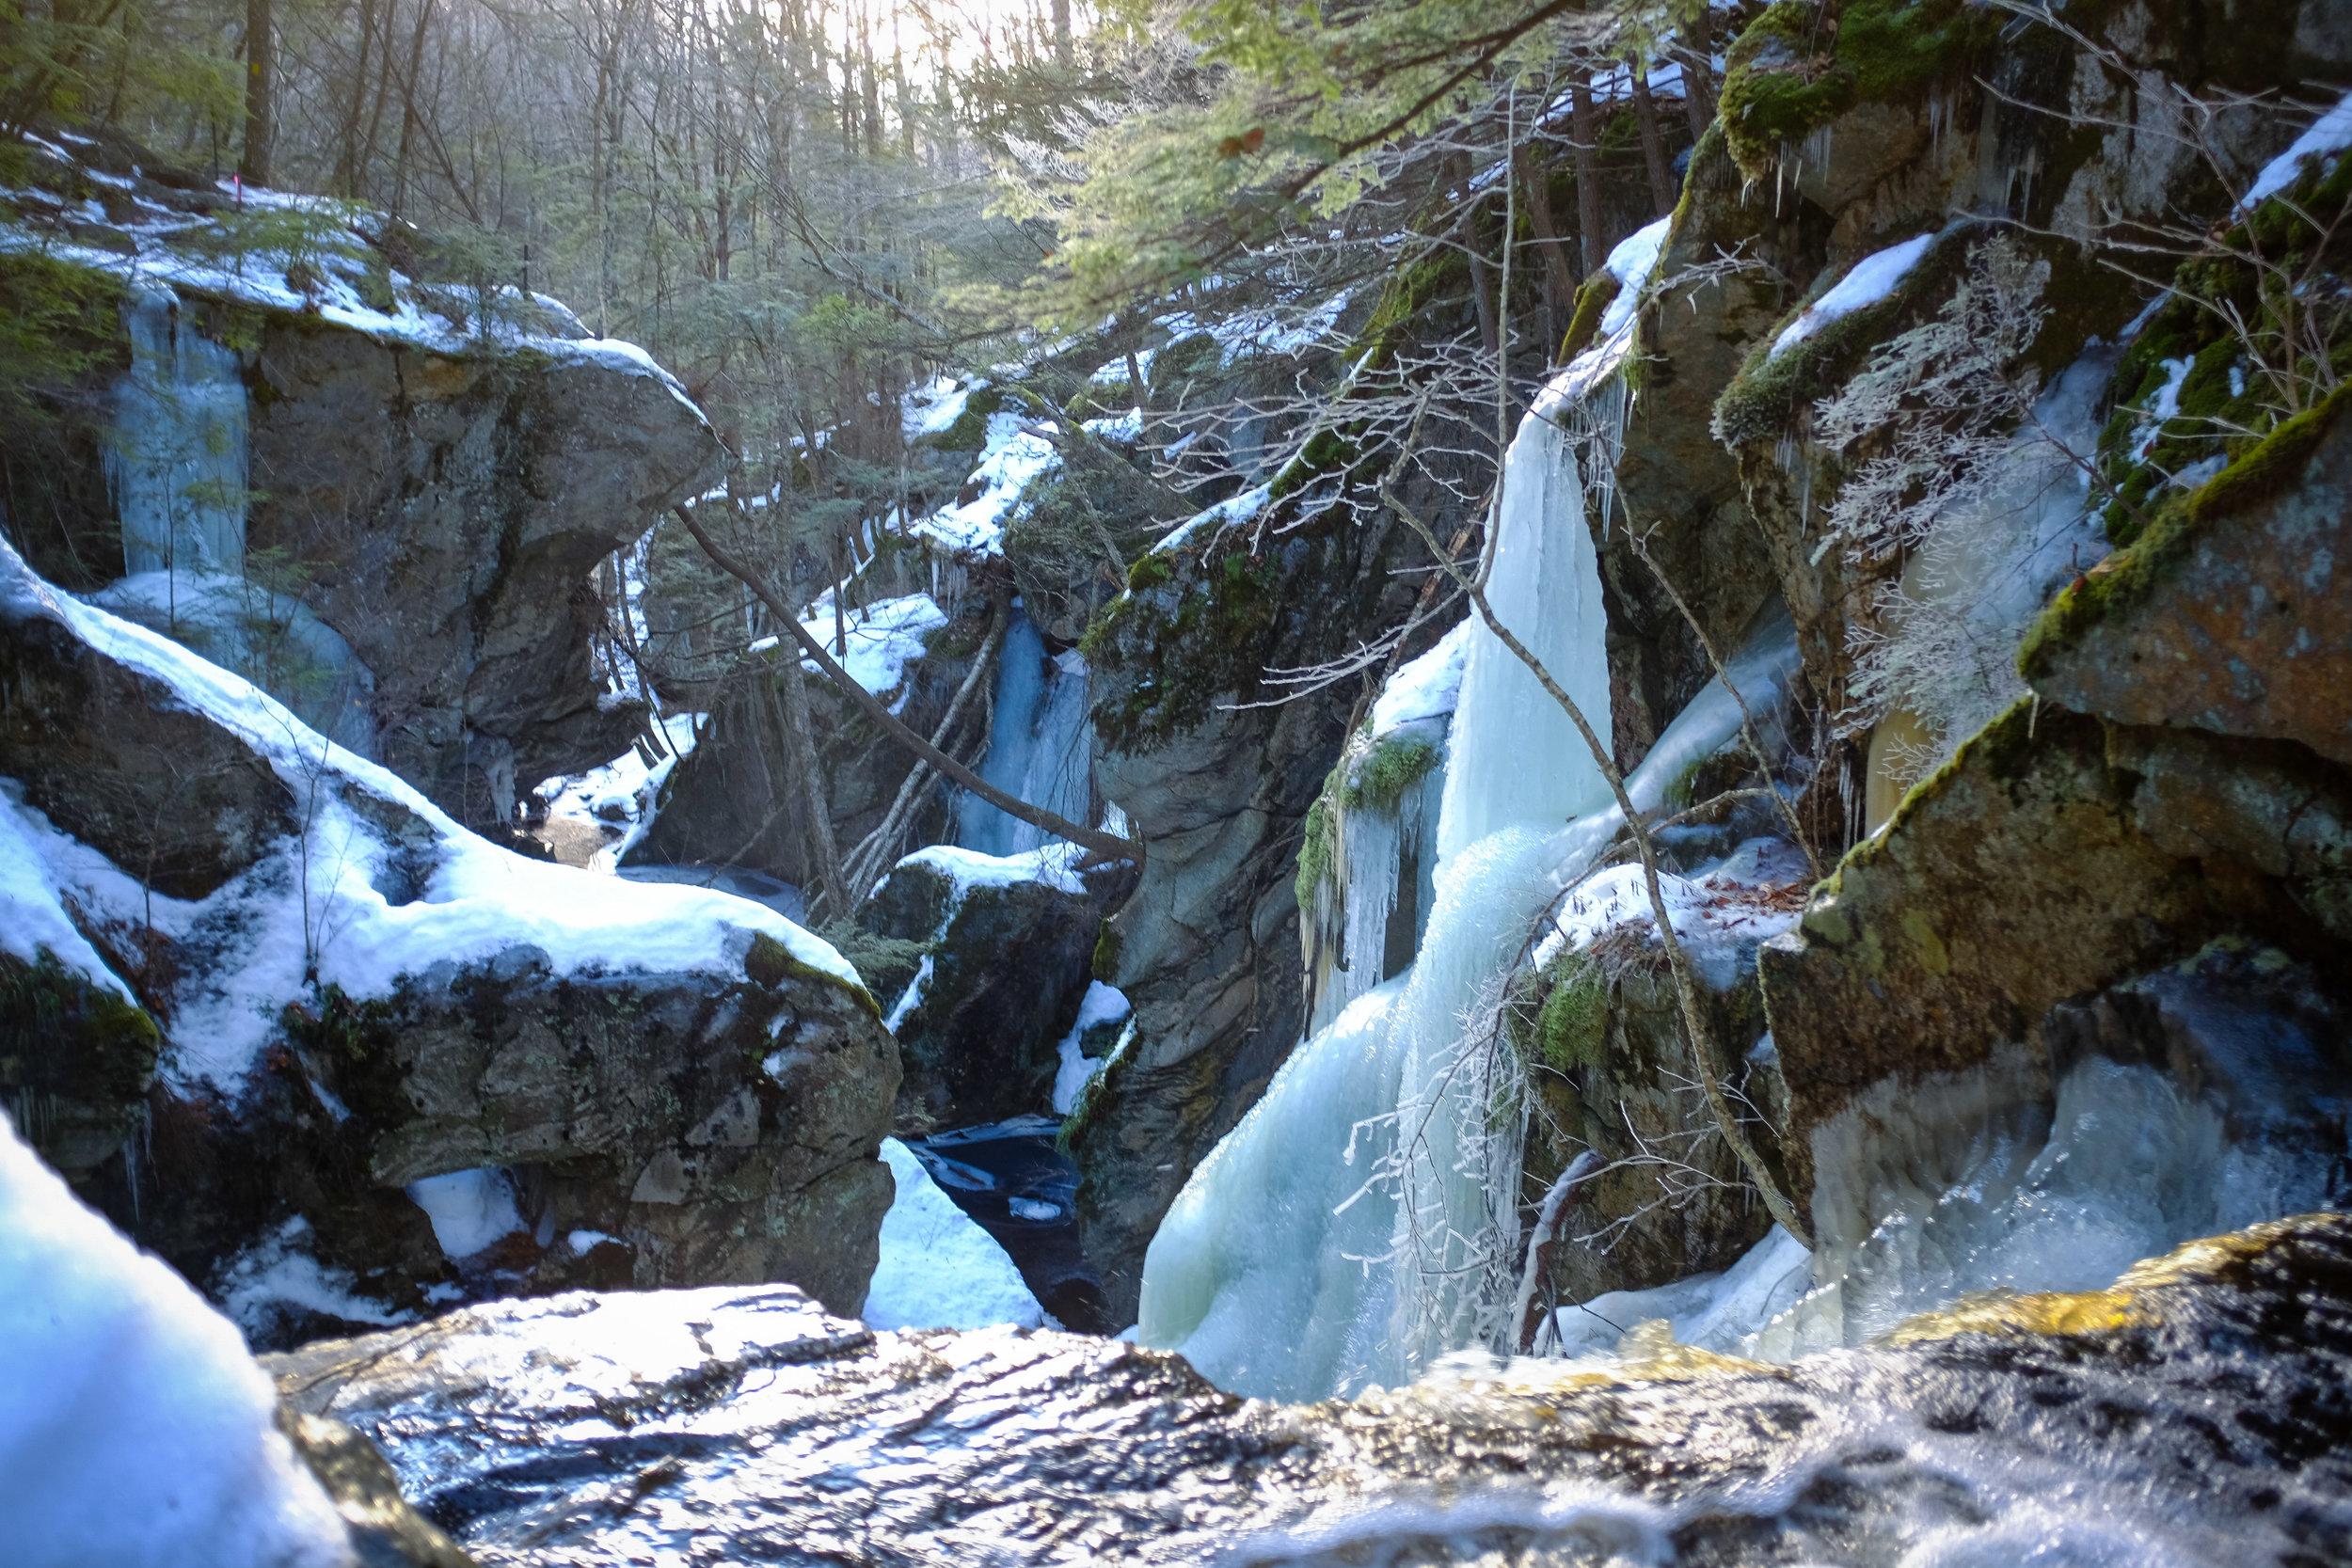 Royalston_Waterfall_1 (1 of 1).jpg